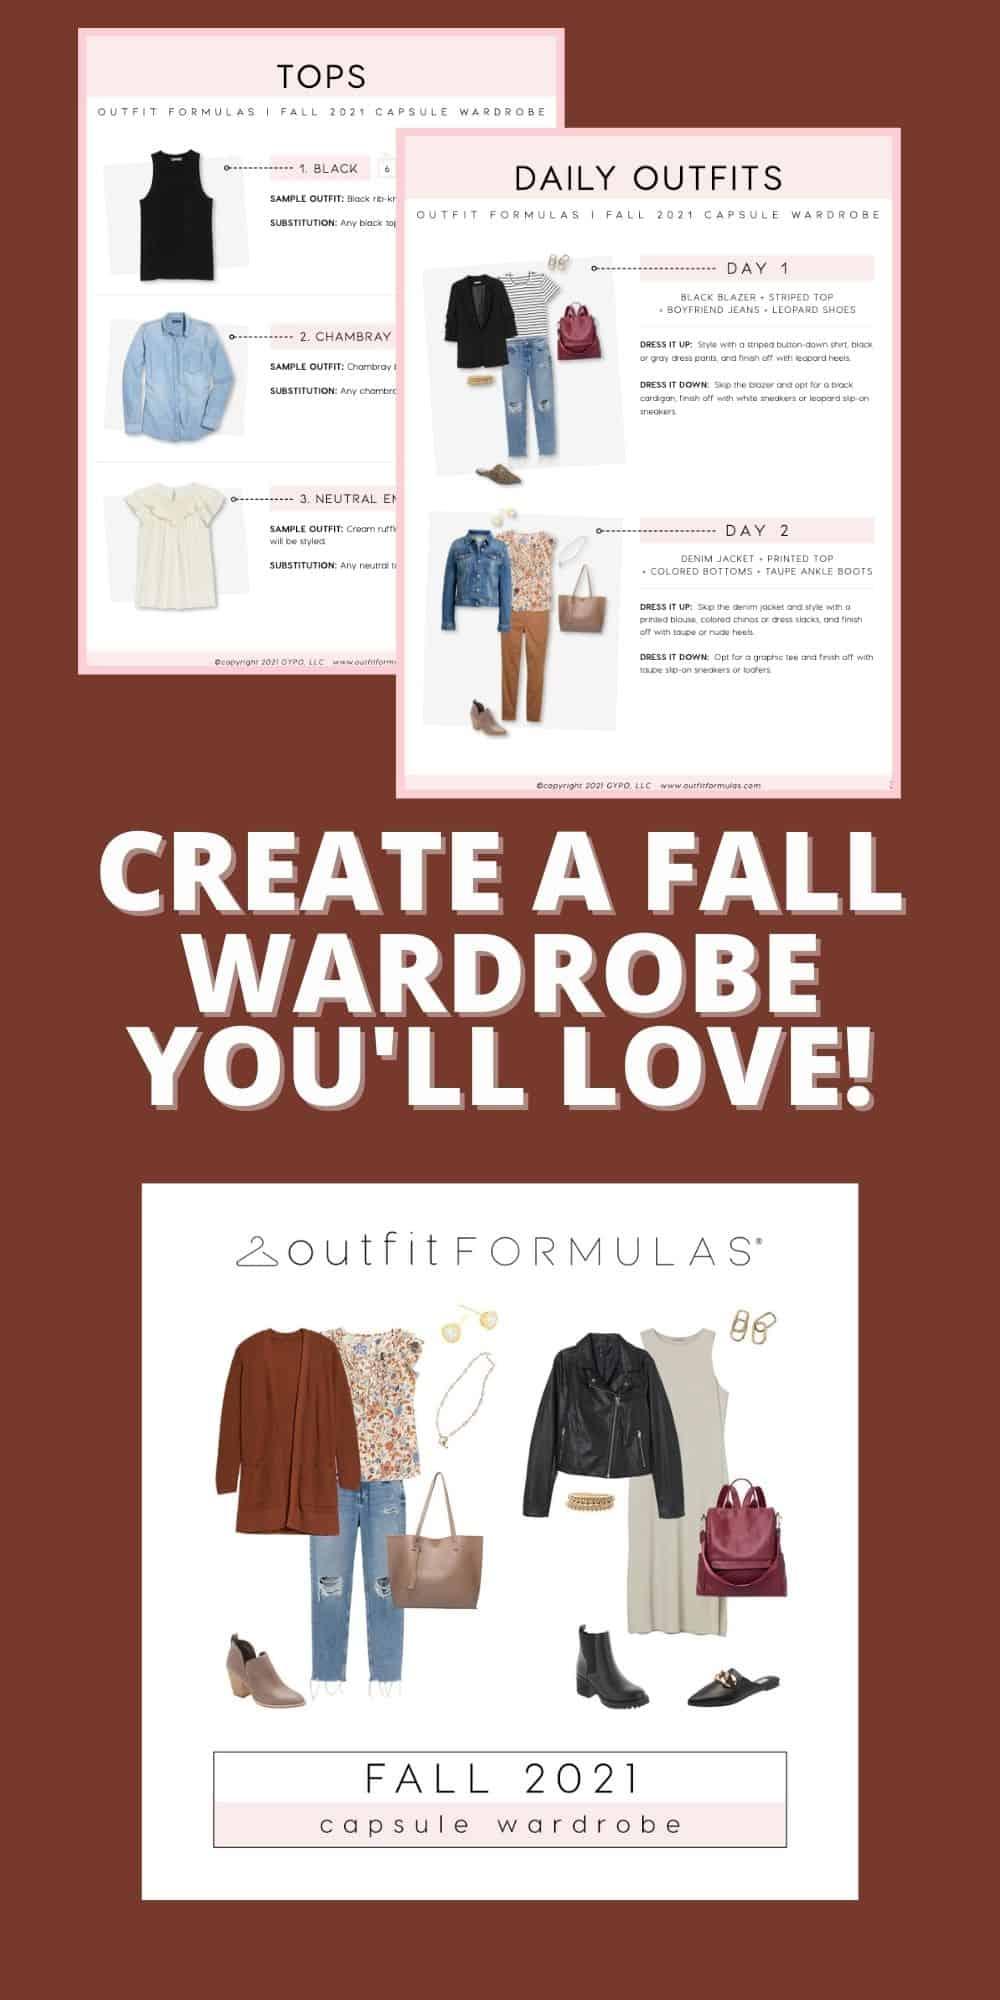 Fall Capsule Wardrobe outfit formulas guide